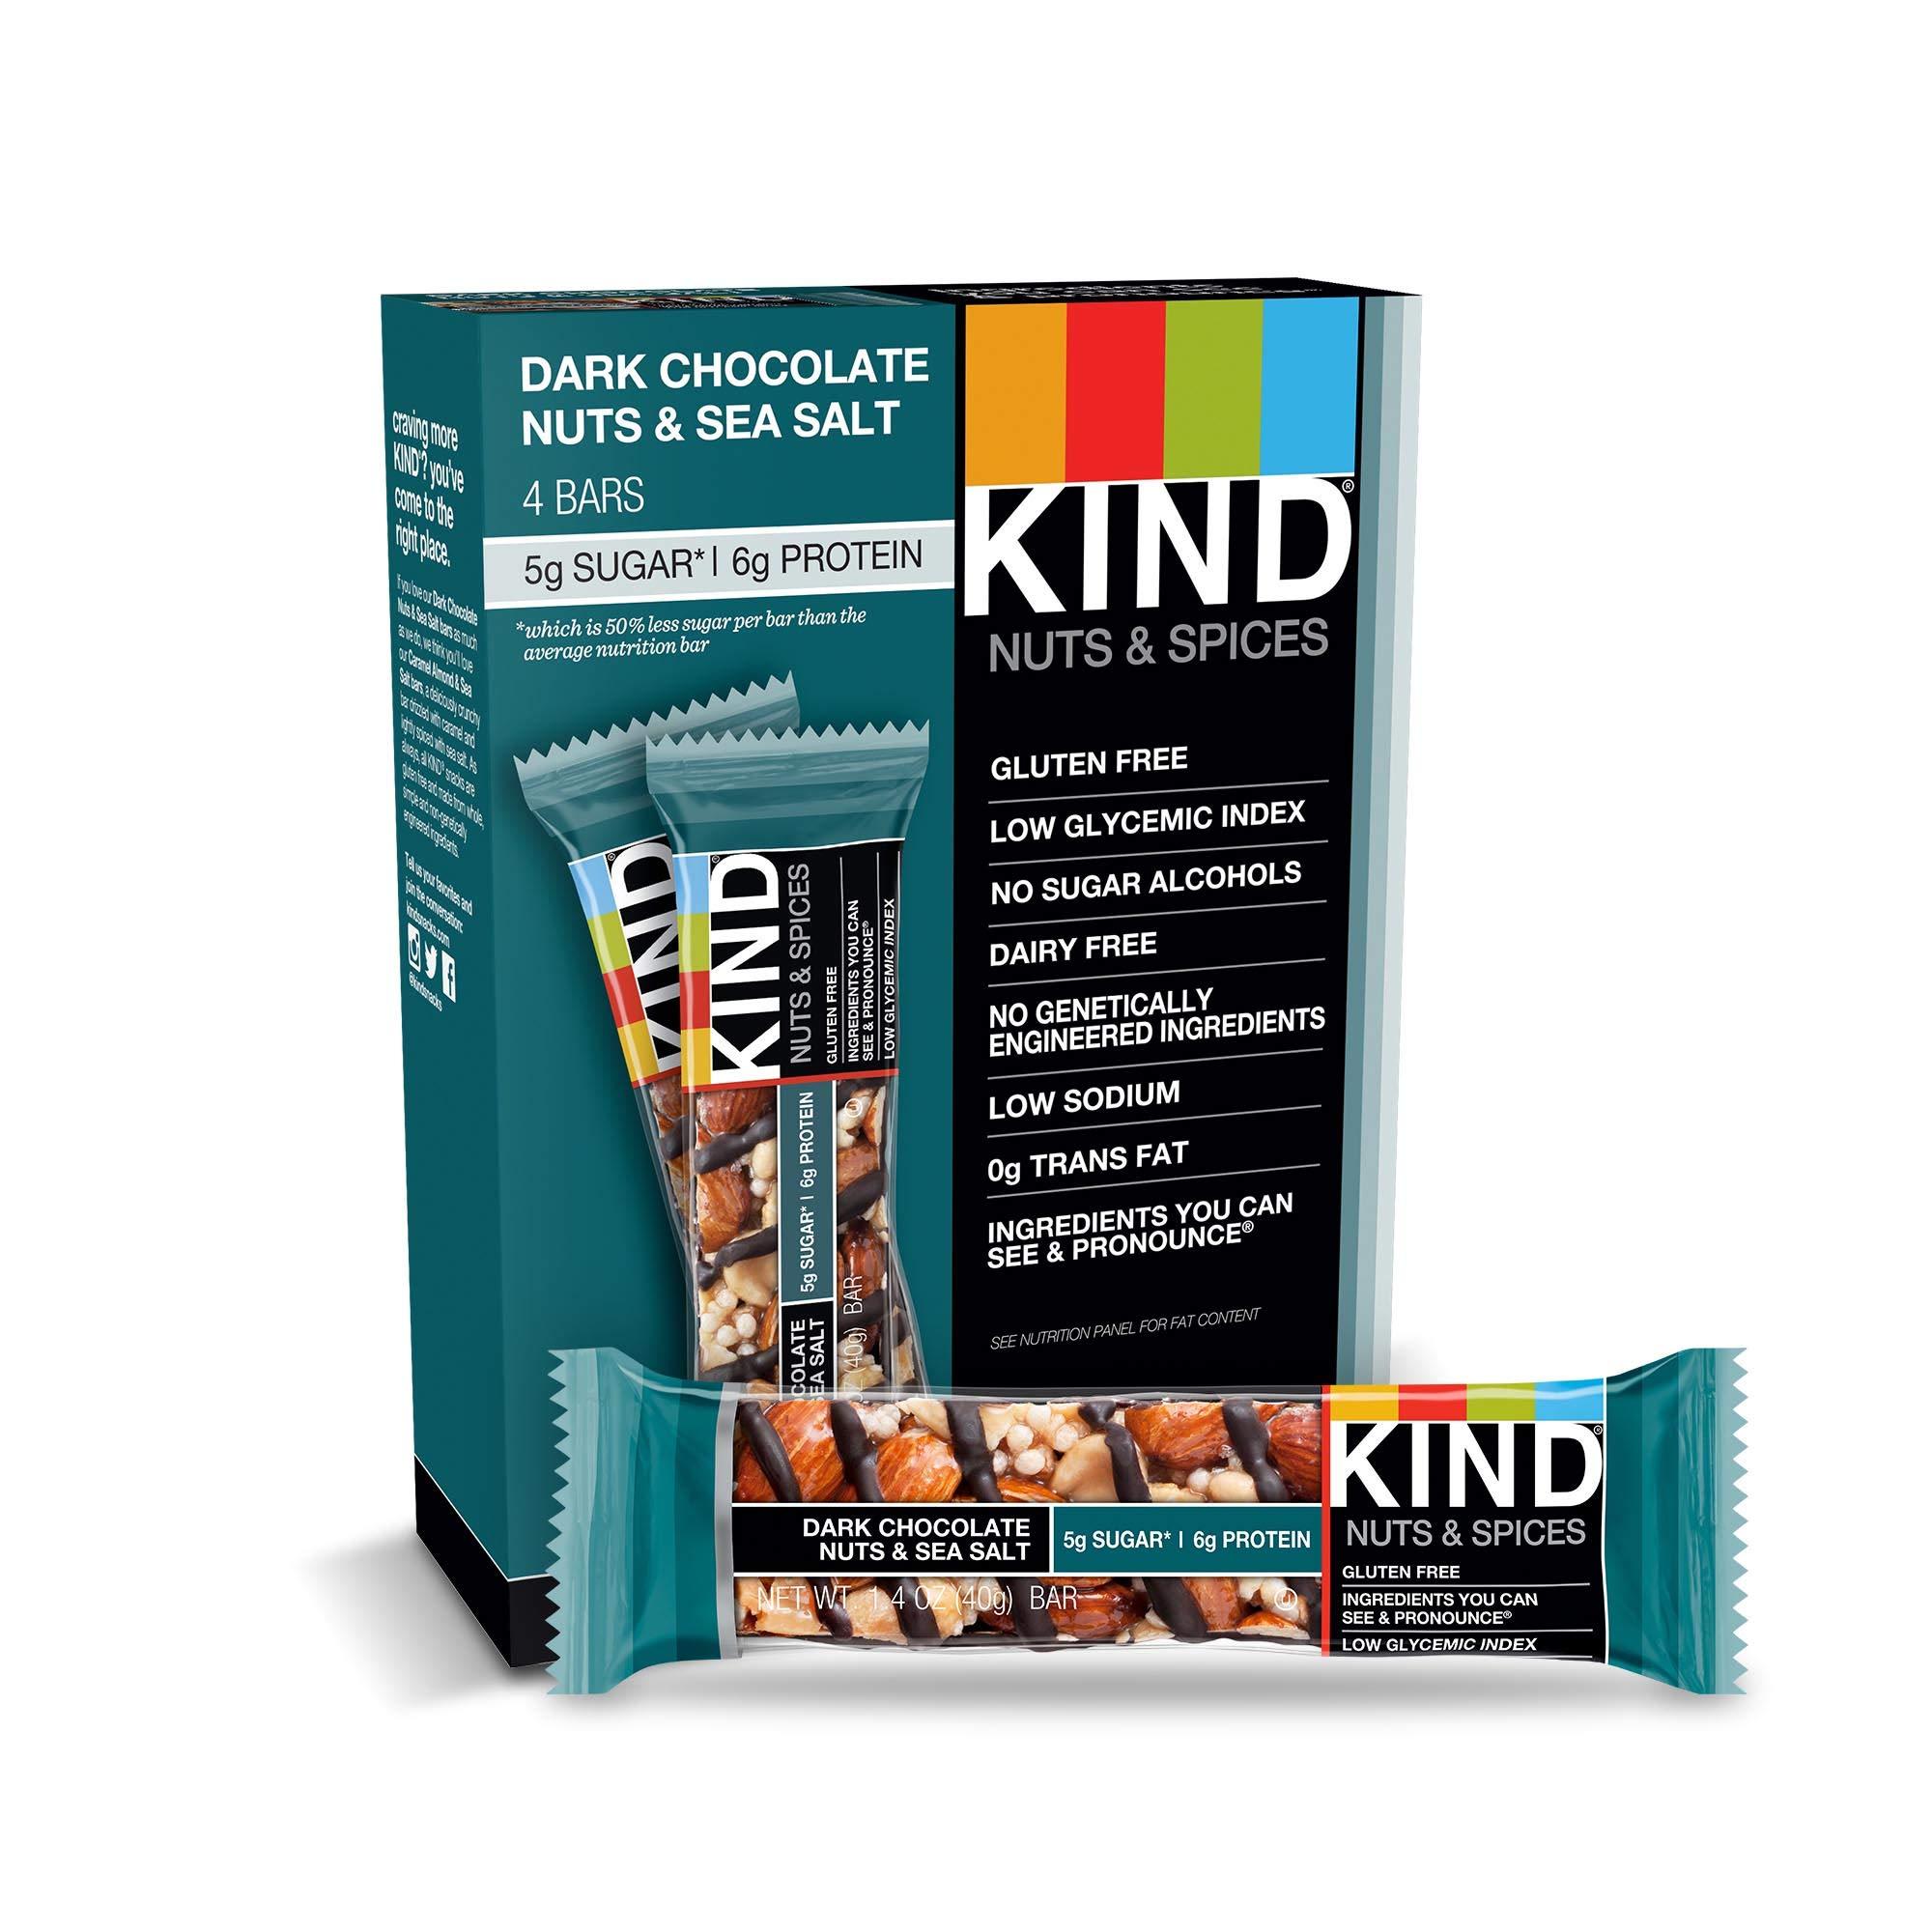 KIND Bars, Dark Chocolate Nuts & Sea Salt, Gluten Free, Low Sugar, 1.4oz, 48 Count